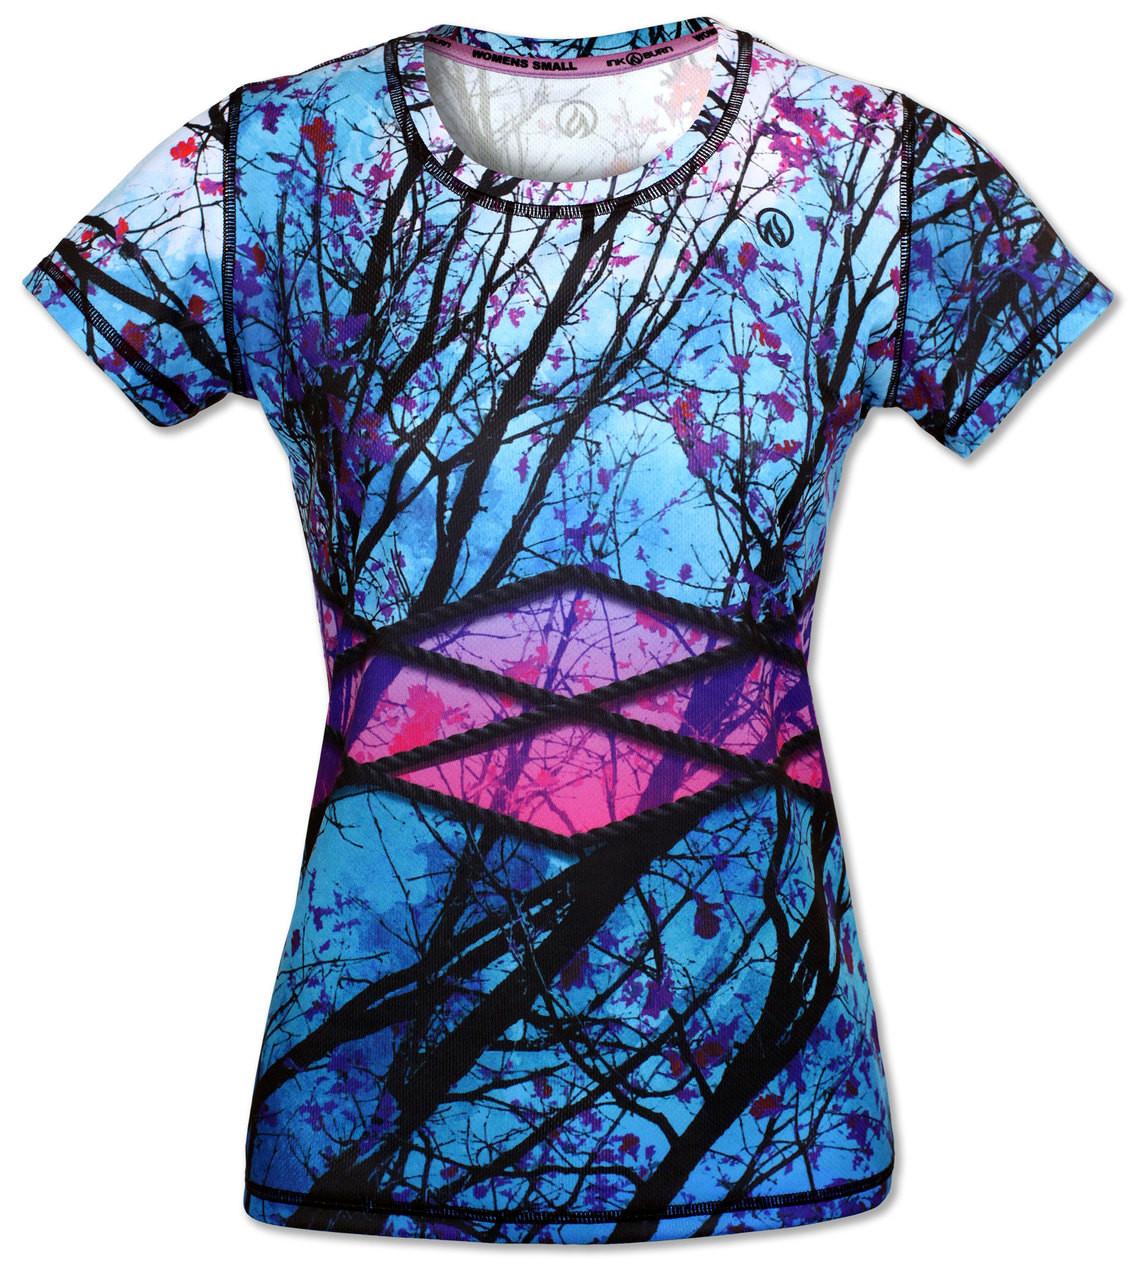 INKnBURN Branches Tech Shirt Front